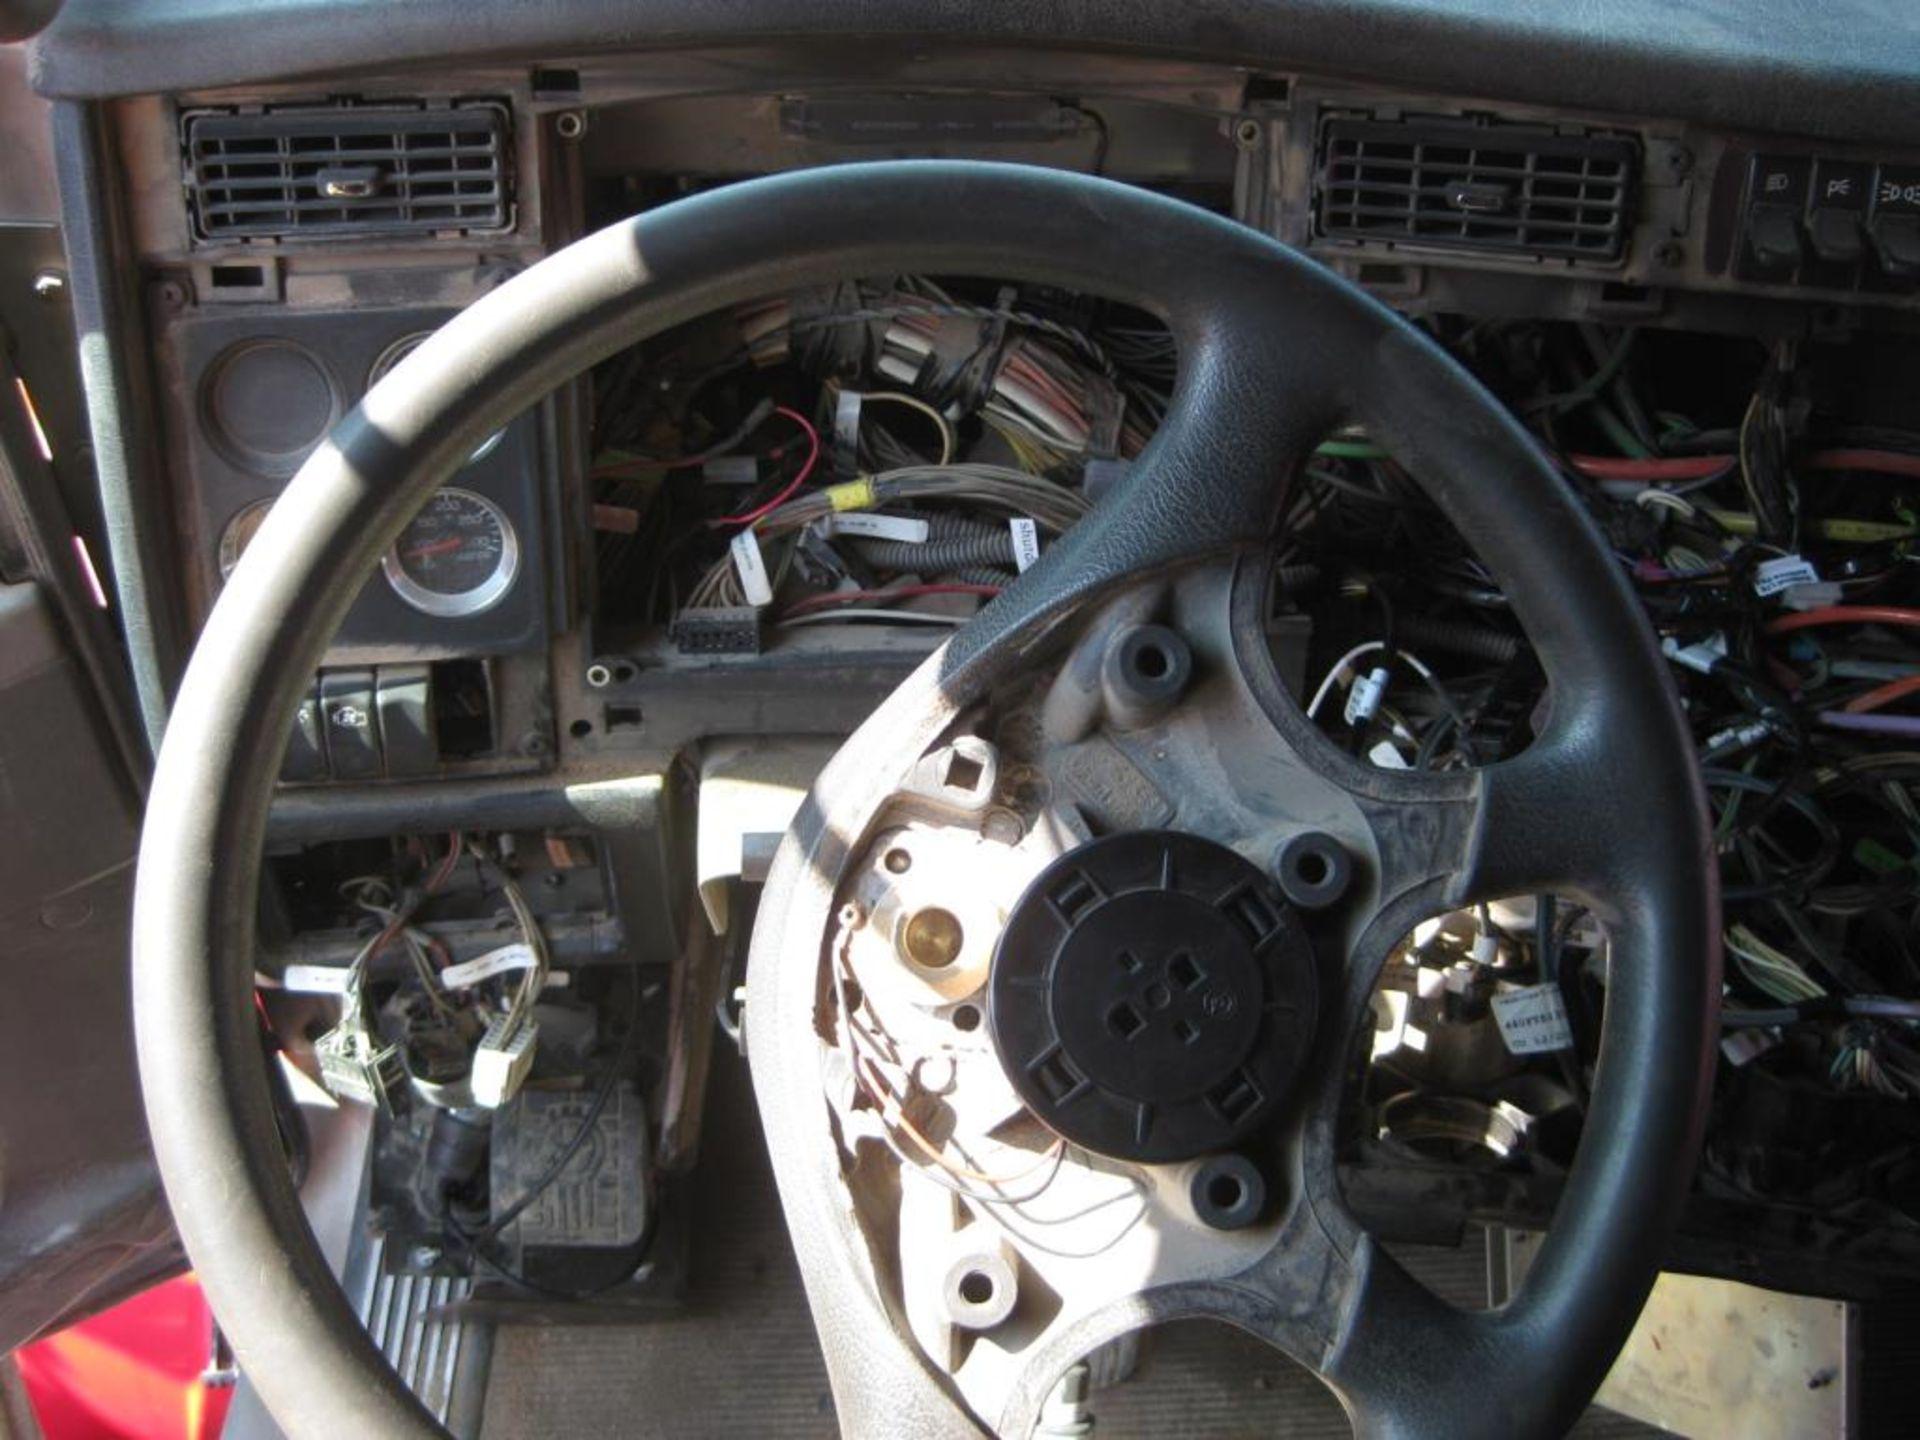 Kenworth Truck - Image 15 of 22